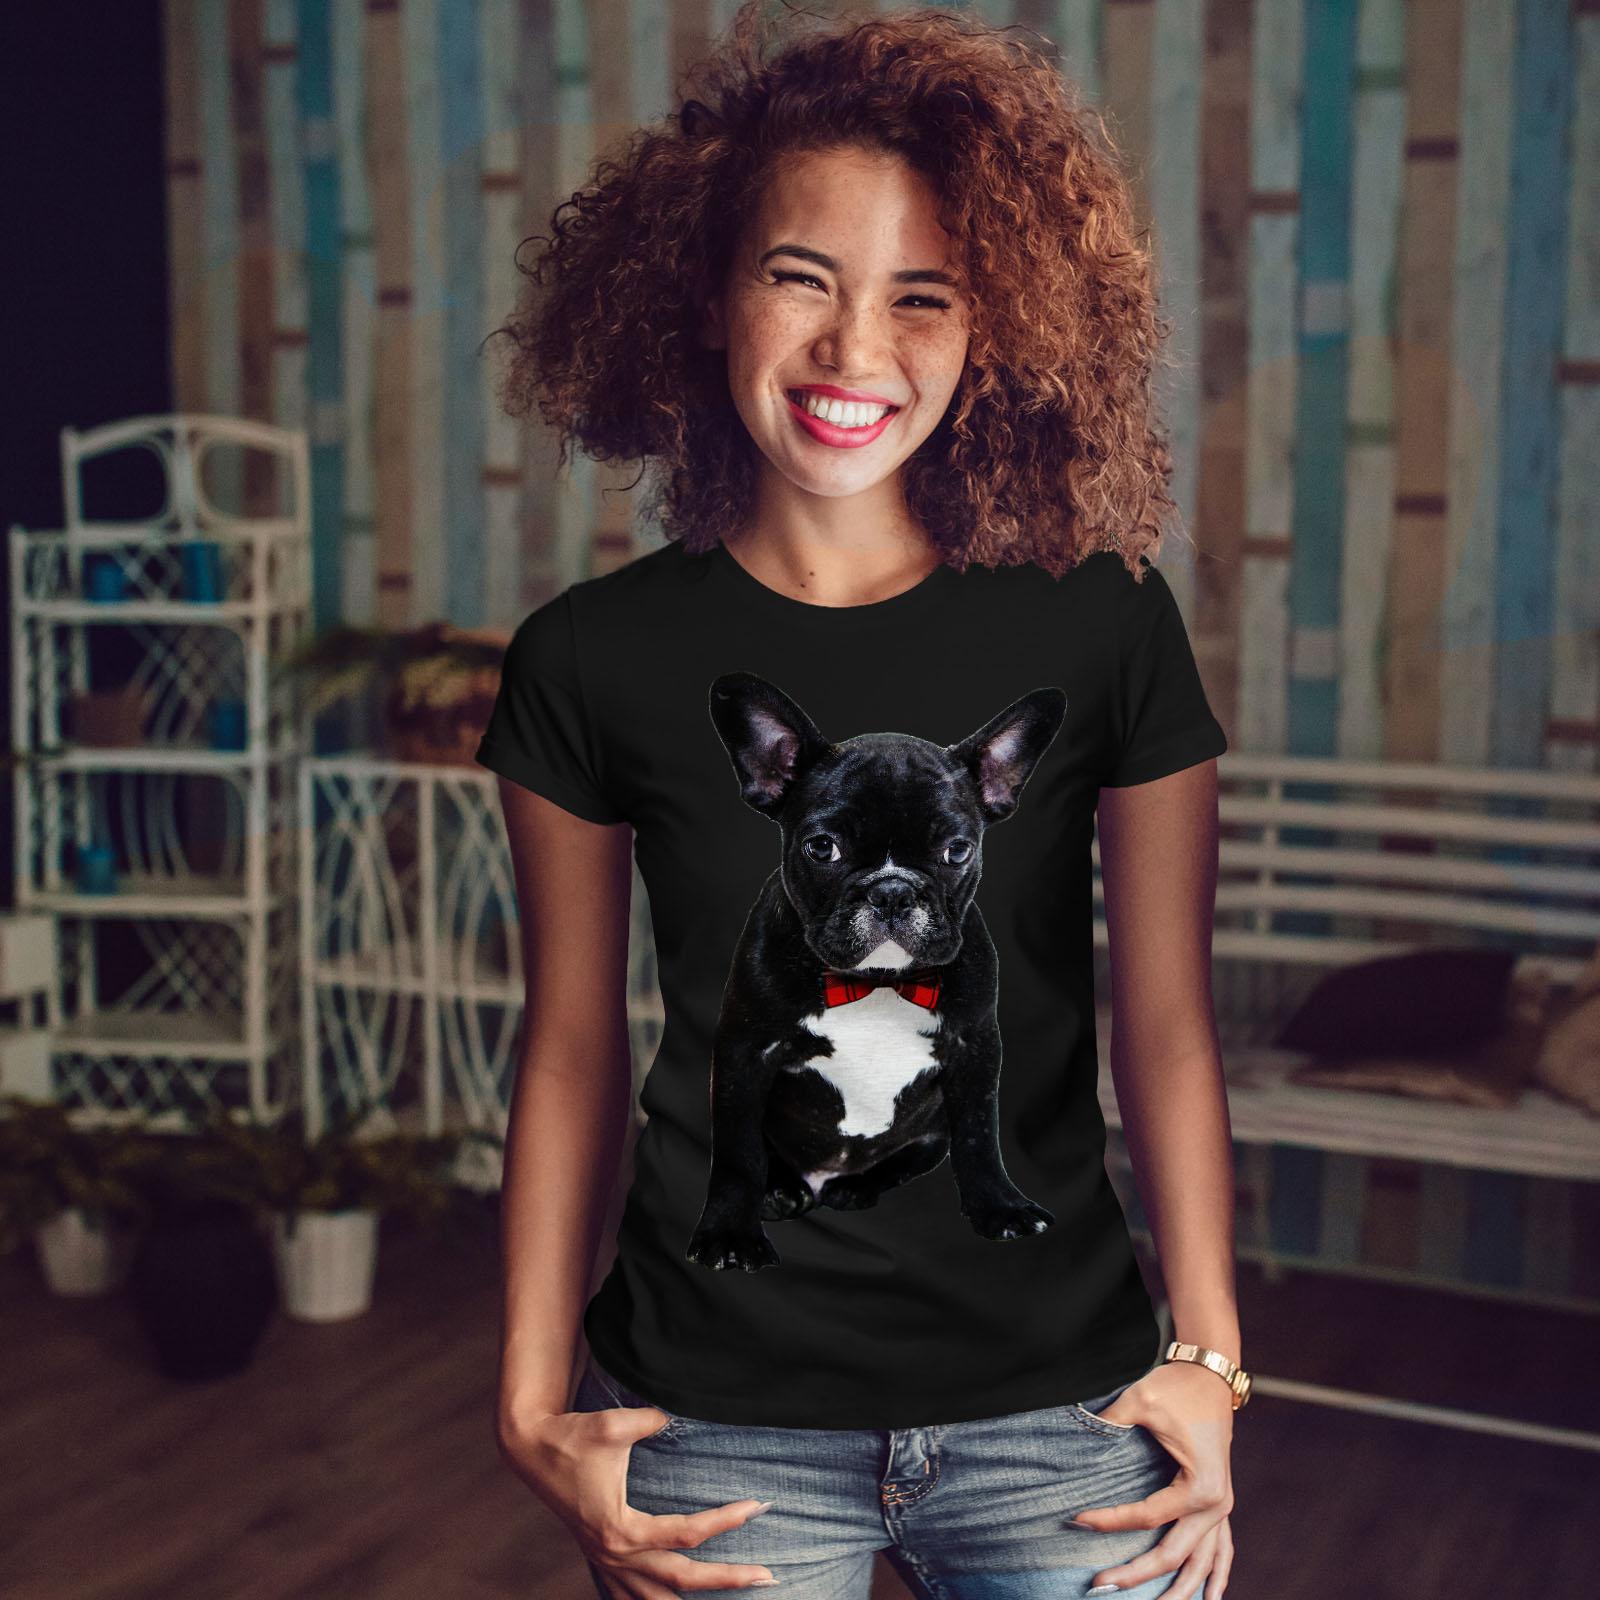 Wellcoda-Fancy-French-Bulldog-T-shirt-Femme-Noir-Casual-Design-Imprime-Tee miniature 4